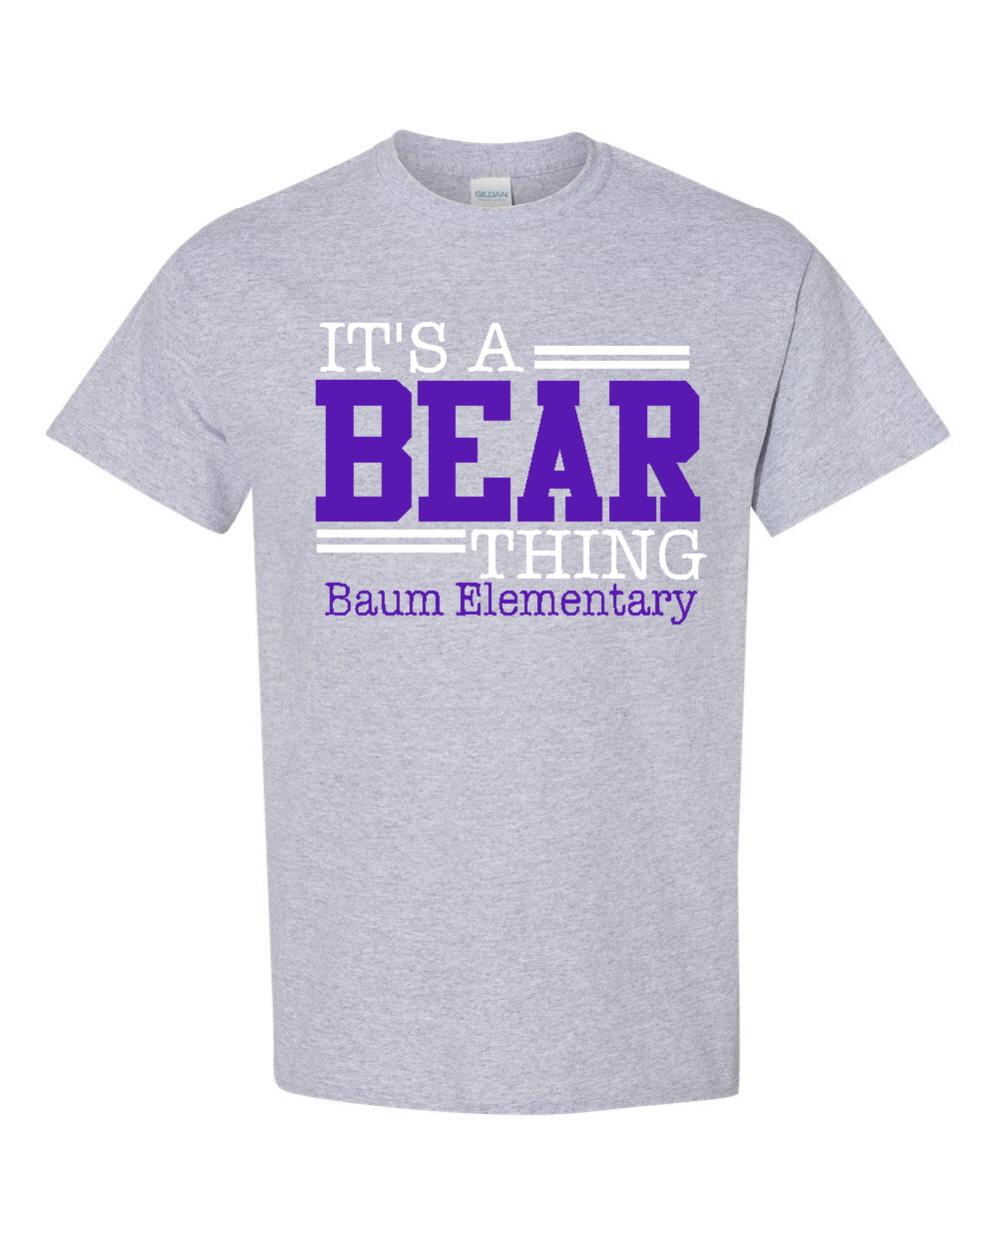 It's A Bear Thing